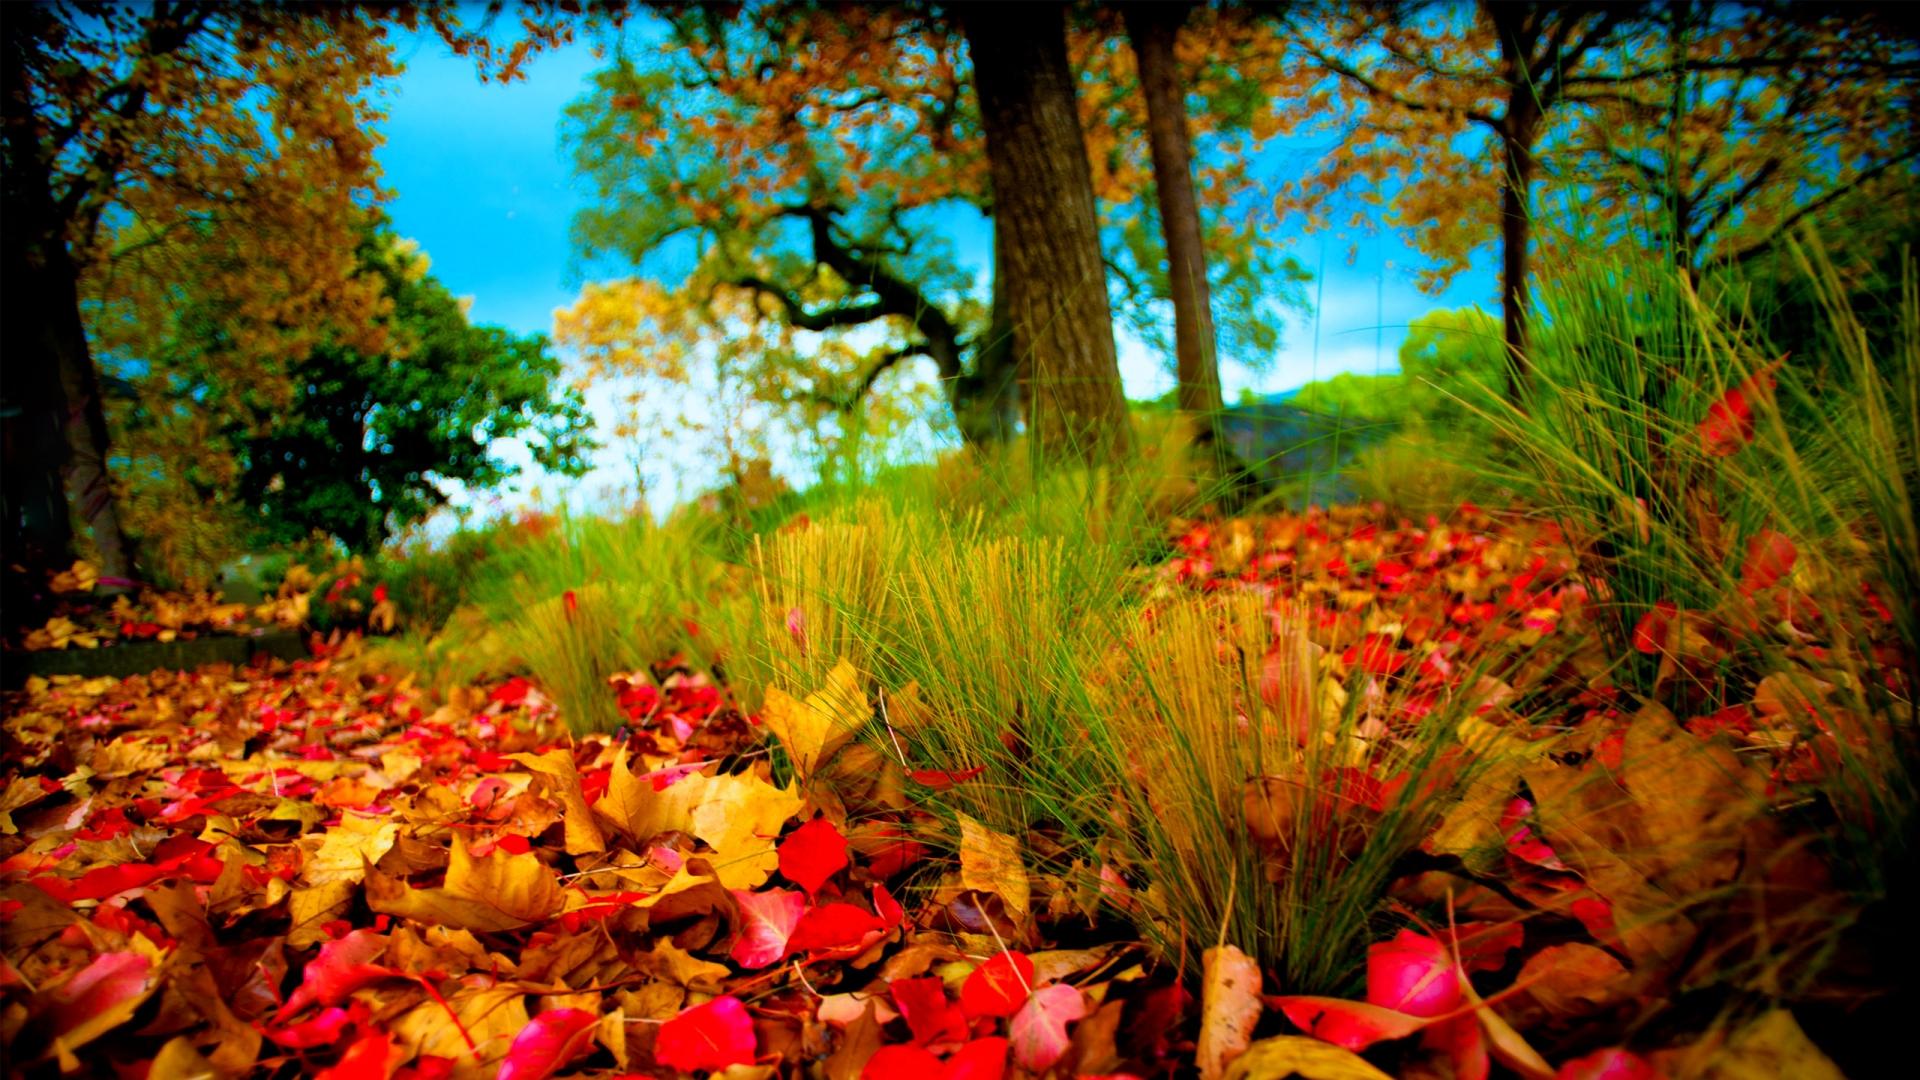 Fall Scenes Images Hd Hd Desktop Wallpapers 4k Hd